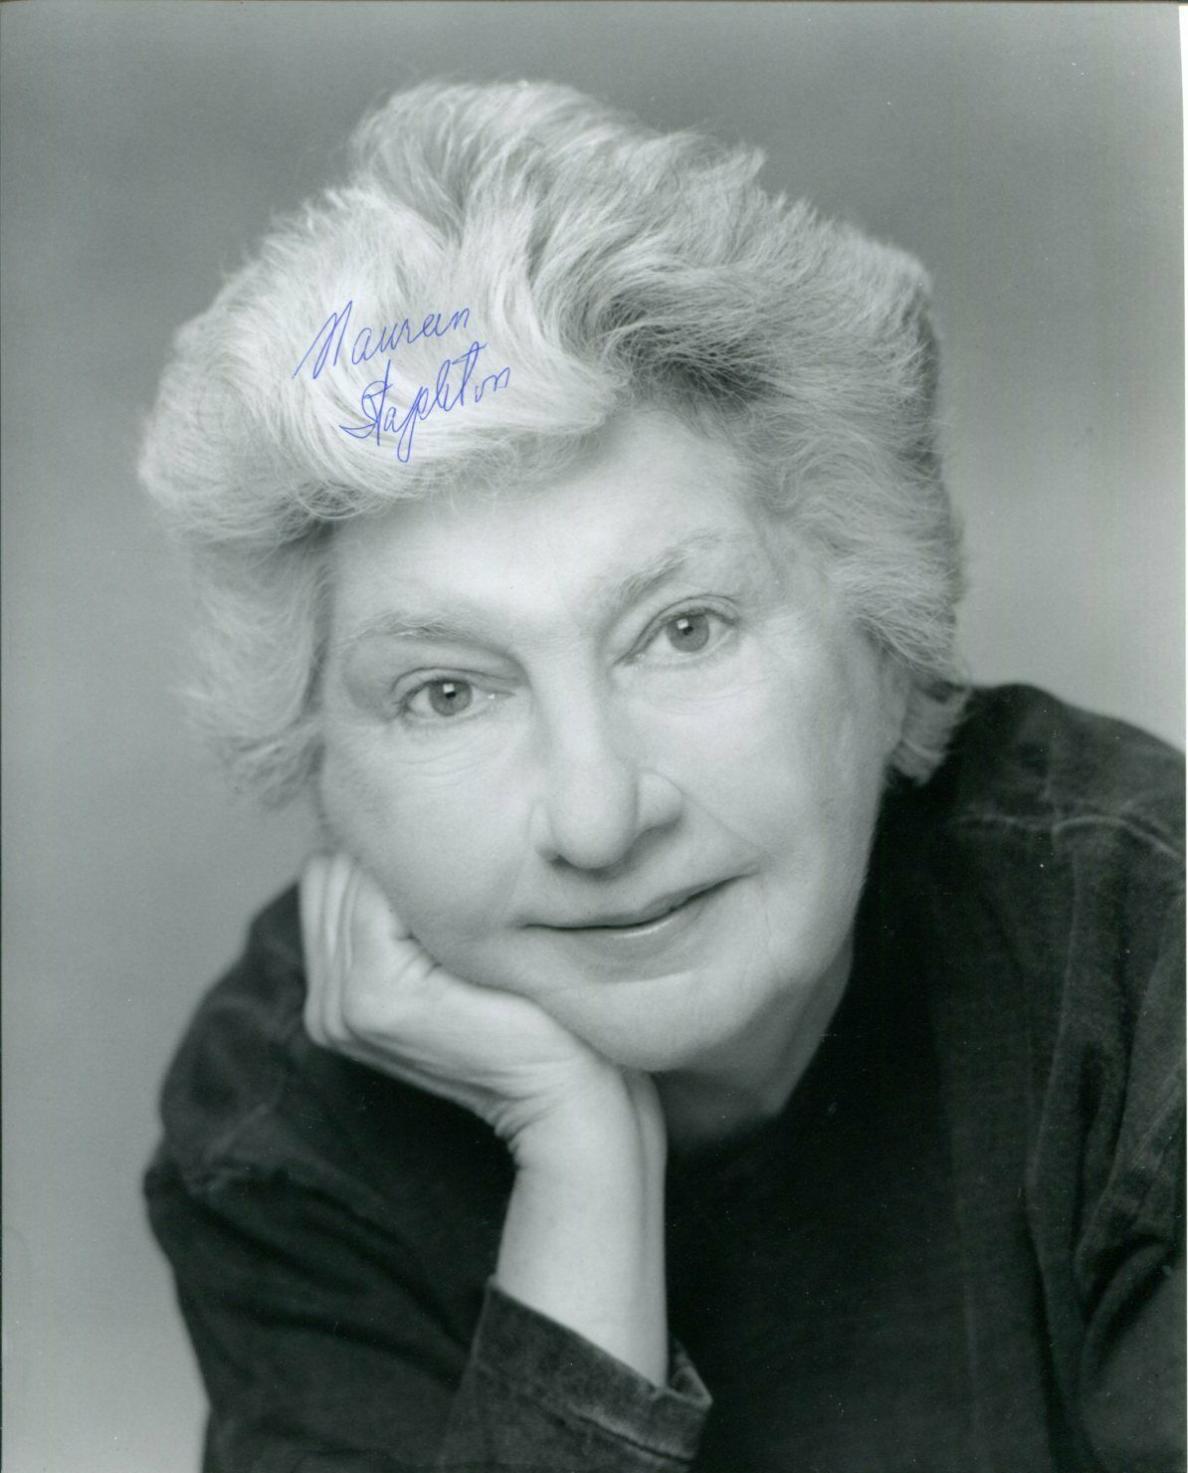 Maureen Stapleton Reds Airport Cocoon Oscar Winner Signed Autograph Photo